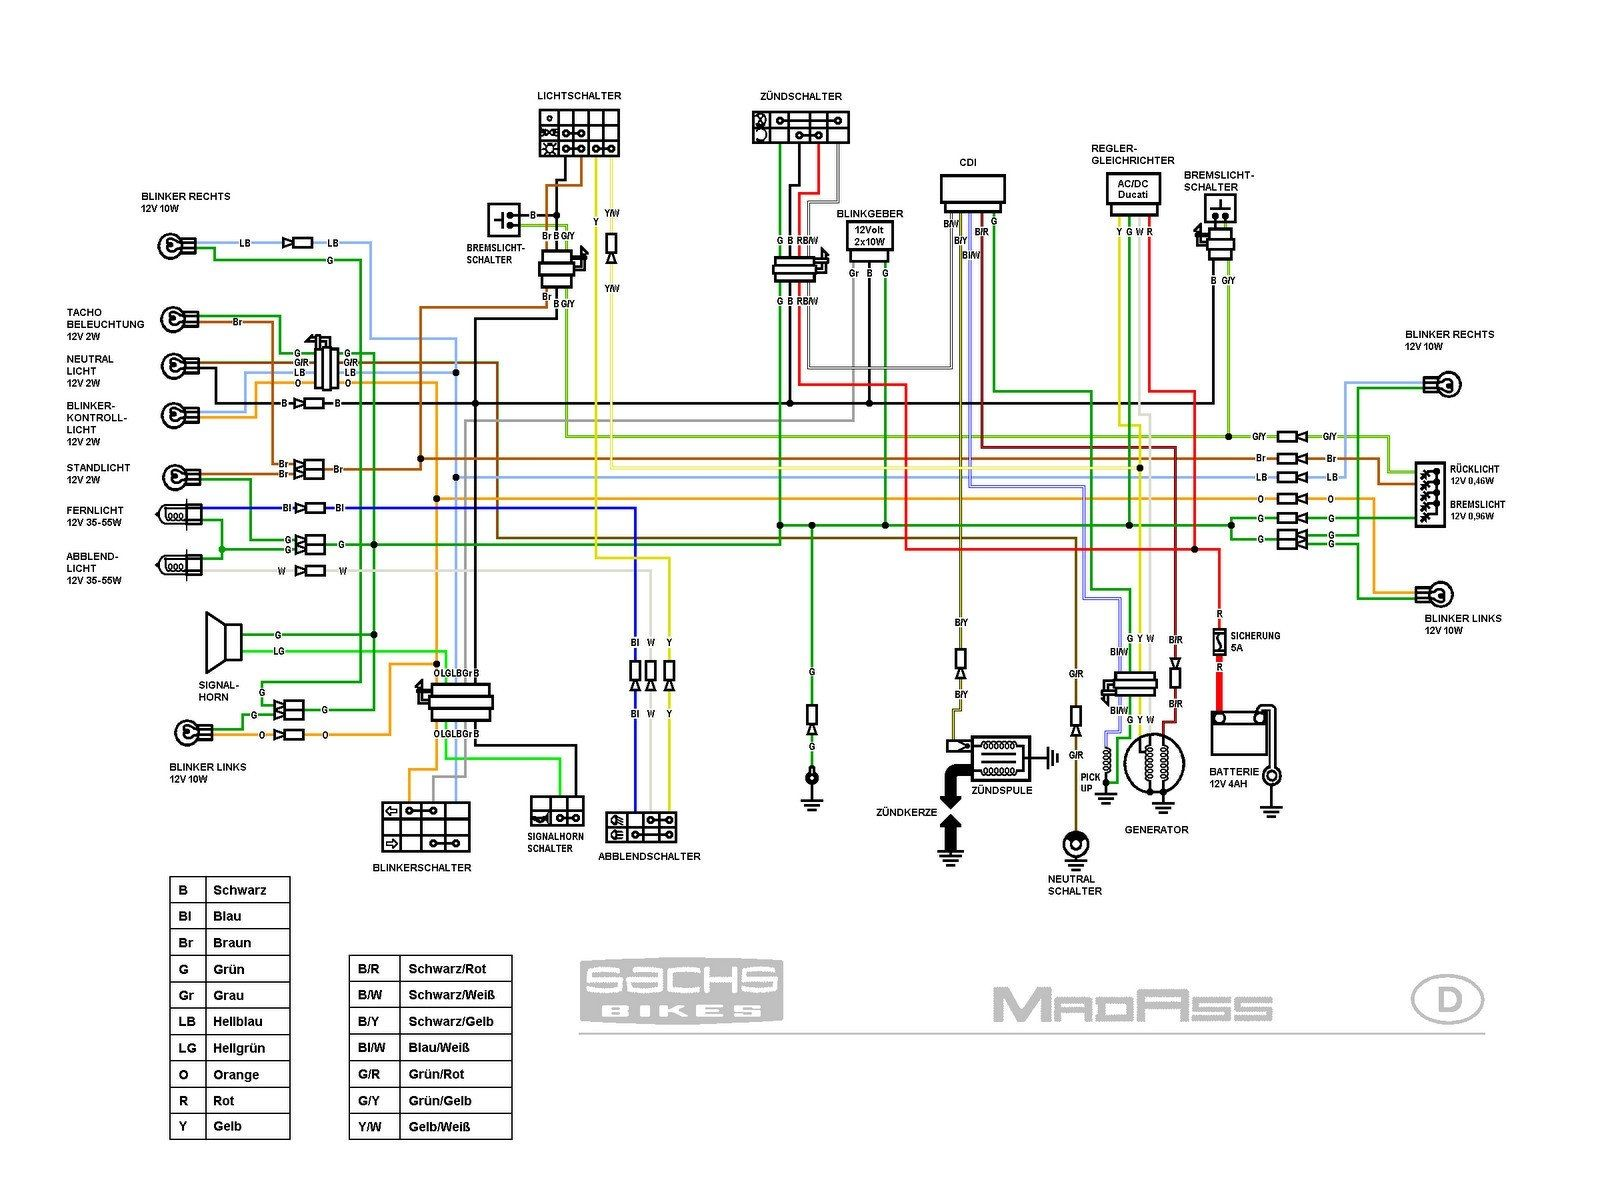 crf50 lifan 125 wiring diagram data diagram schematic crf50 lifan 125 wiring [ 1600 x 1200 Pixel ]